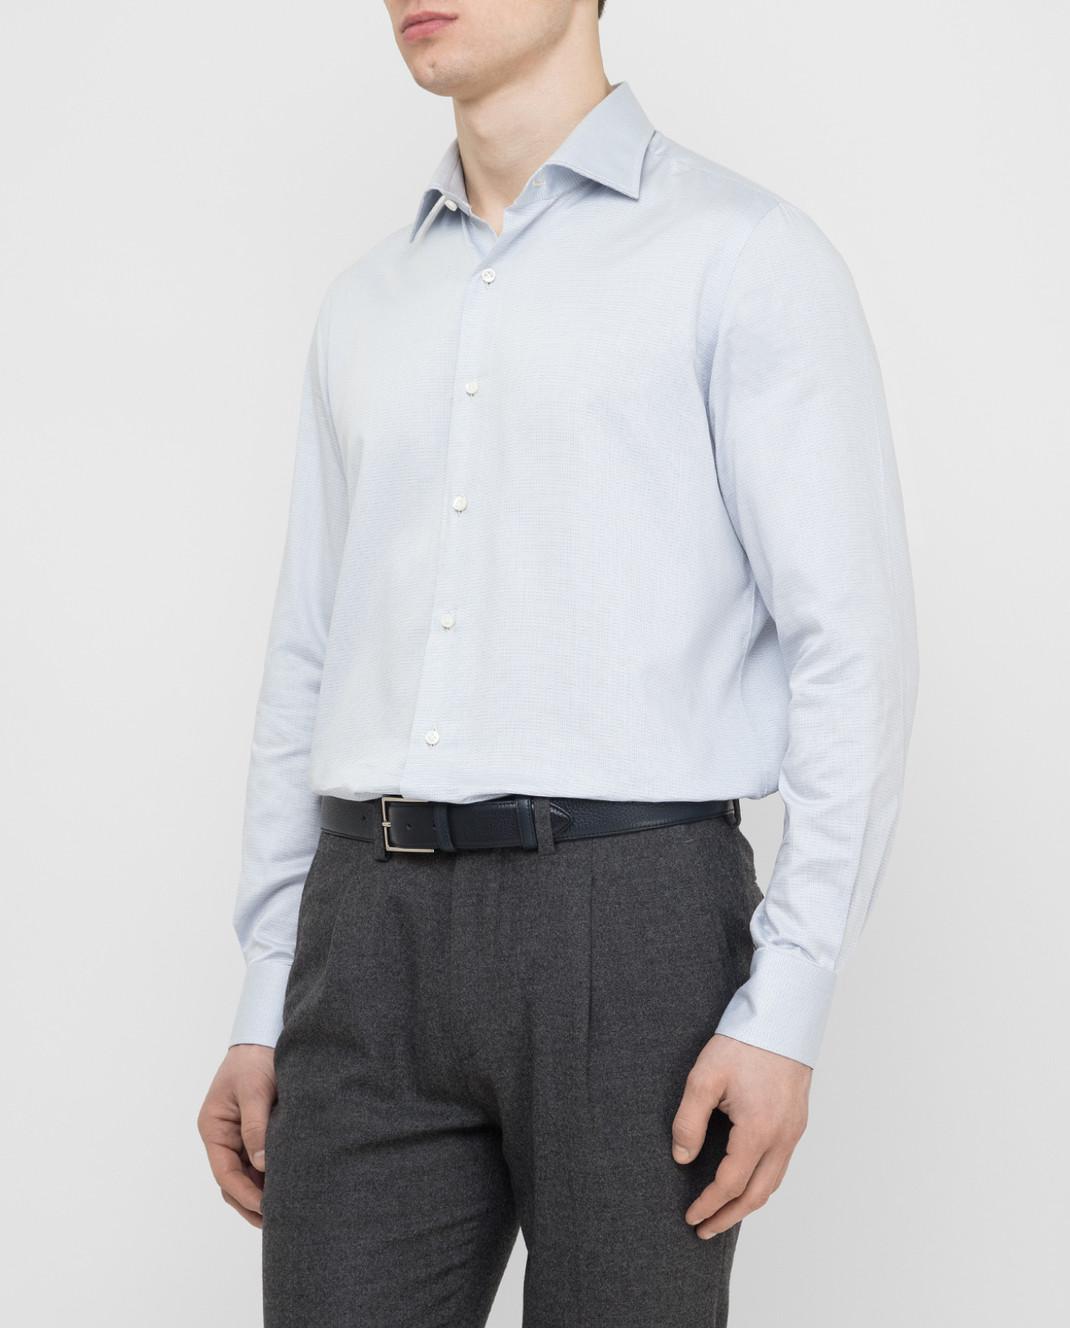 Luciano Lombardi Голубая рубашка 66216210 изображение 3